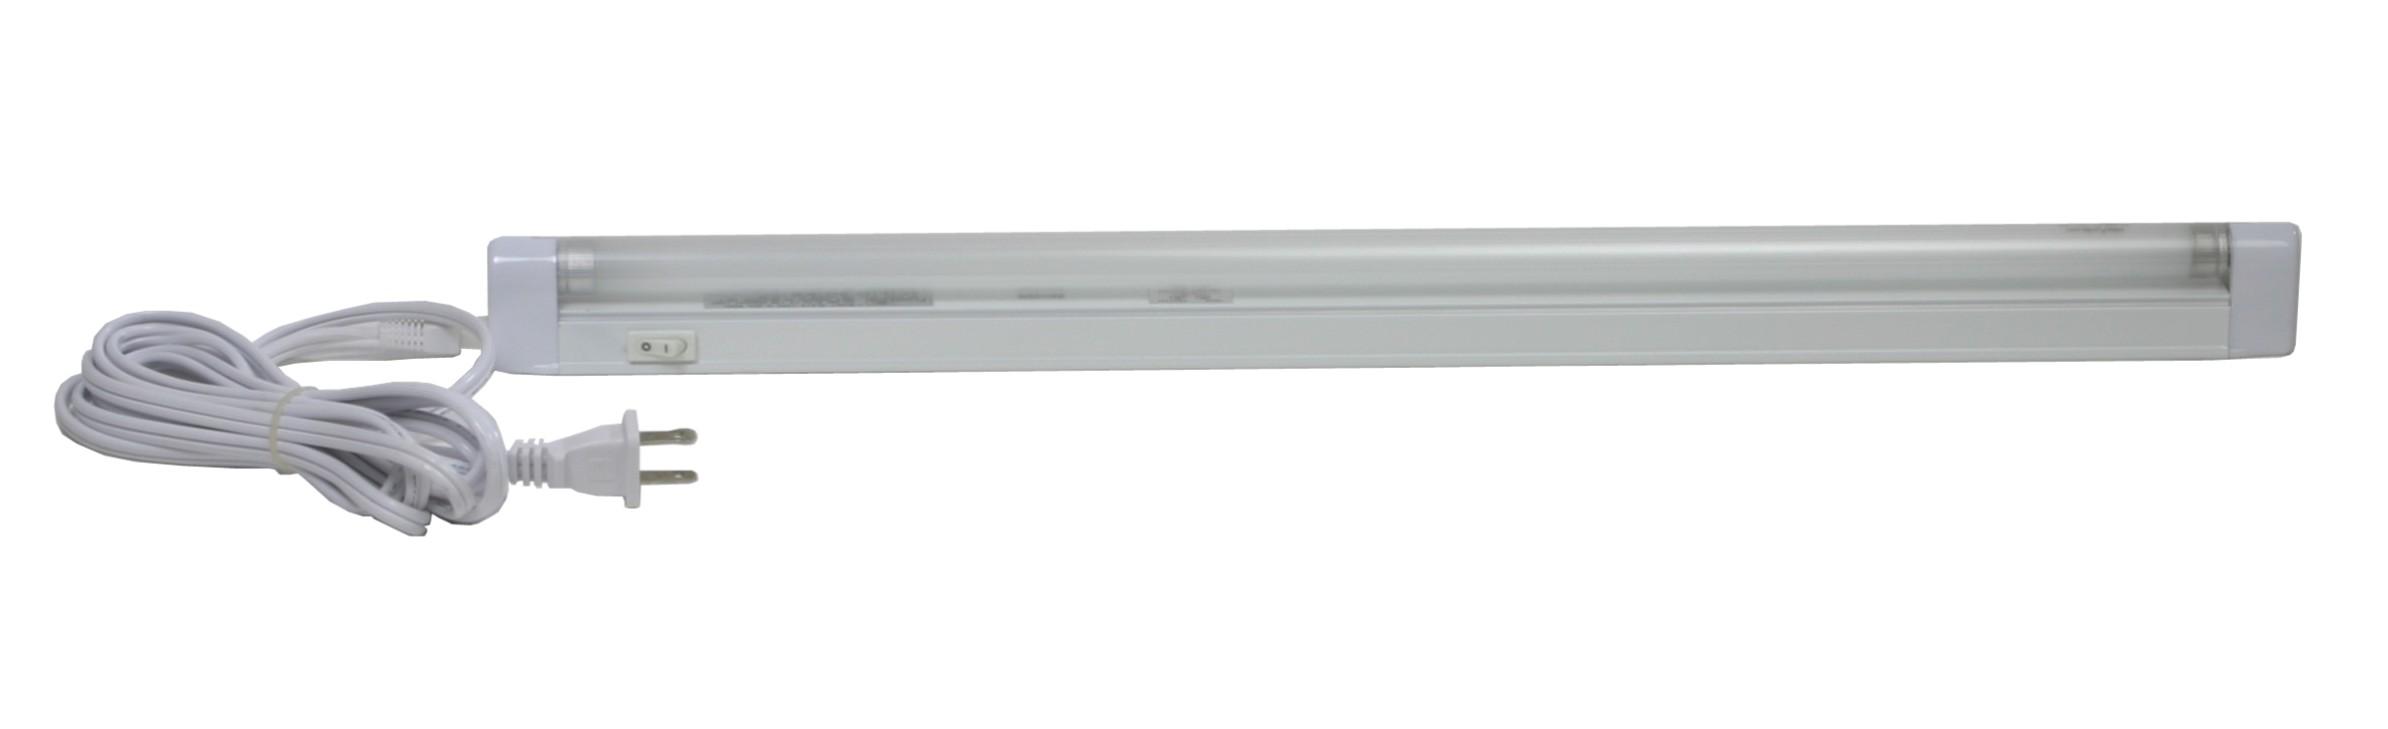 Replacing With Led Fc 3560 356 16 Watt White Slimline Fluorescent Fixture